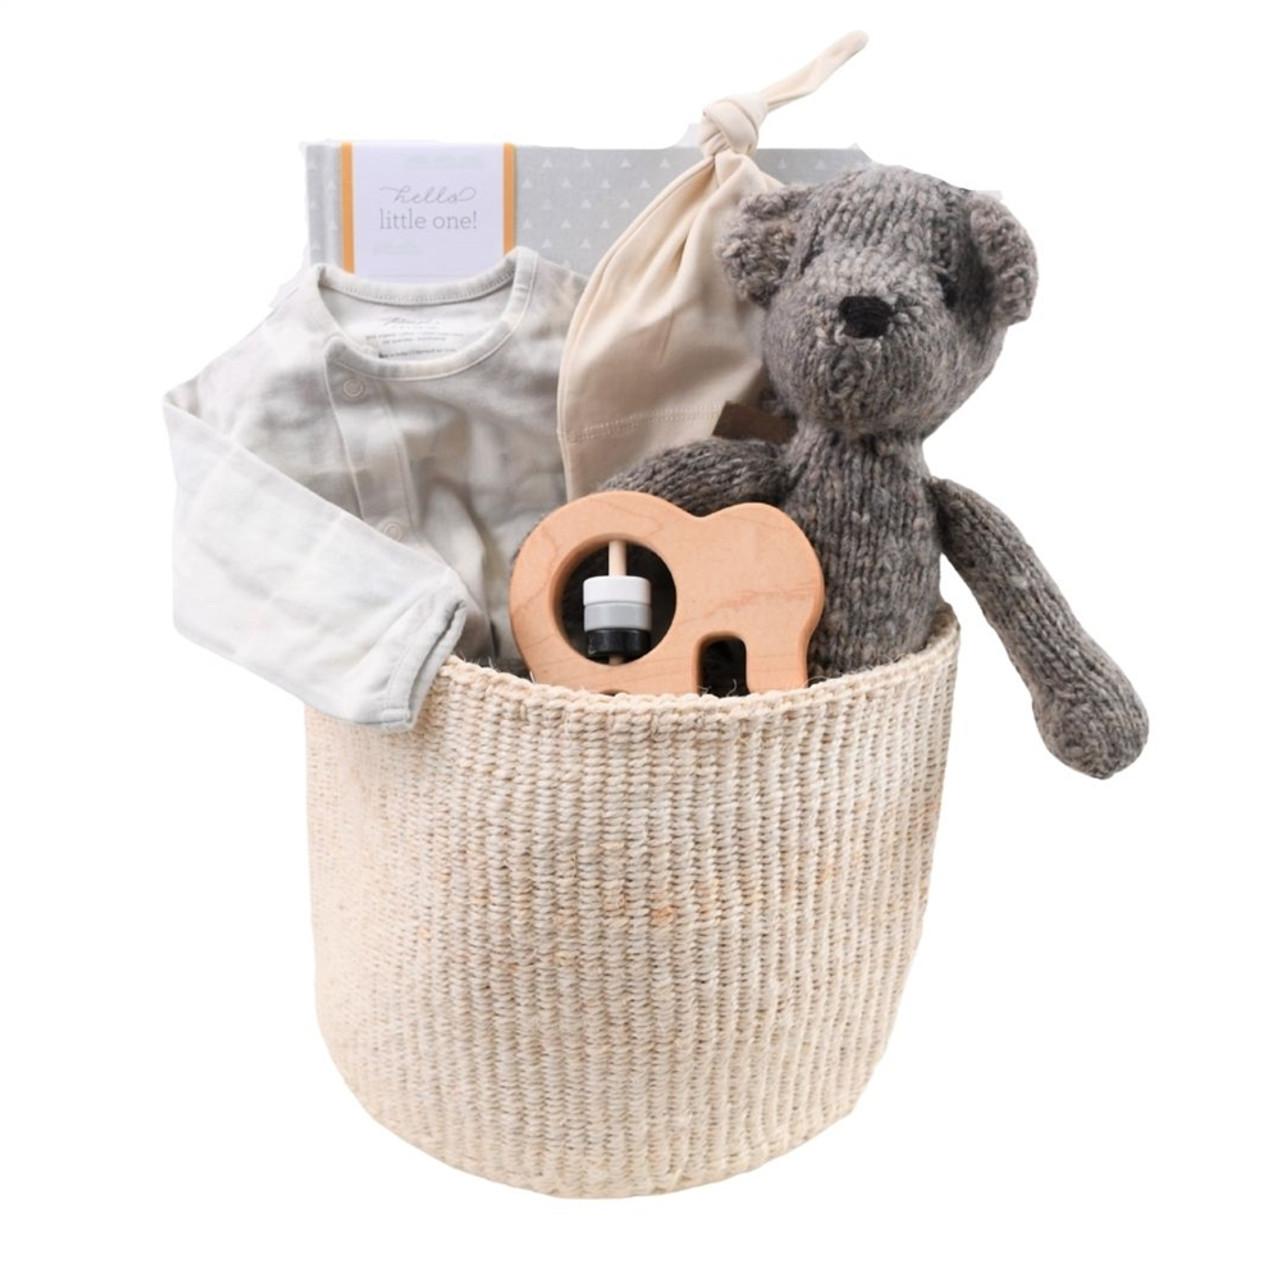 Baby's Keepsake Gift Basket - Timeless Treasures